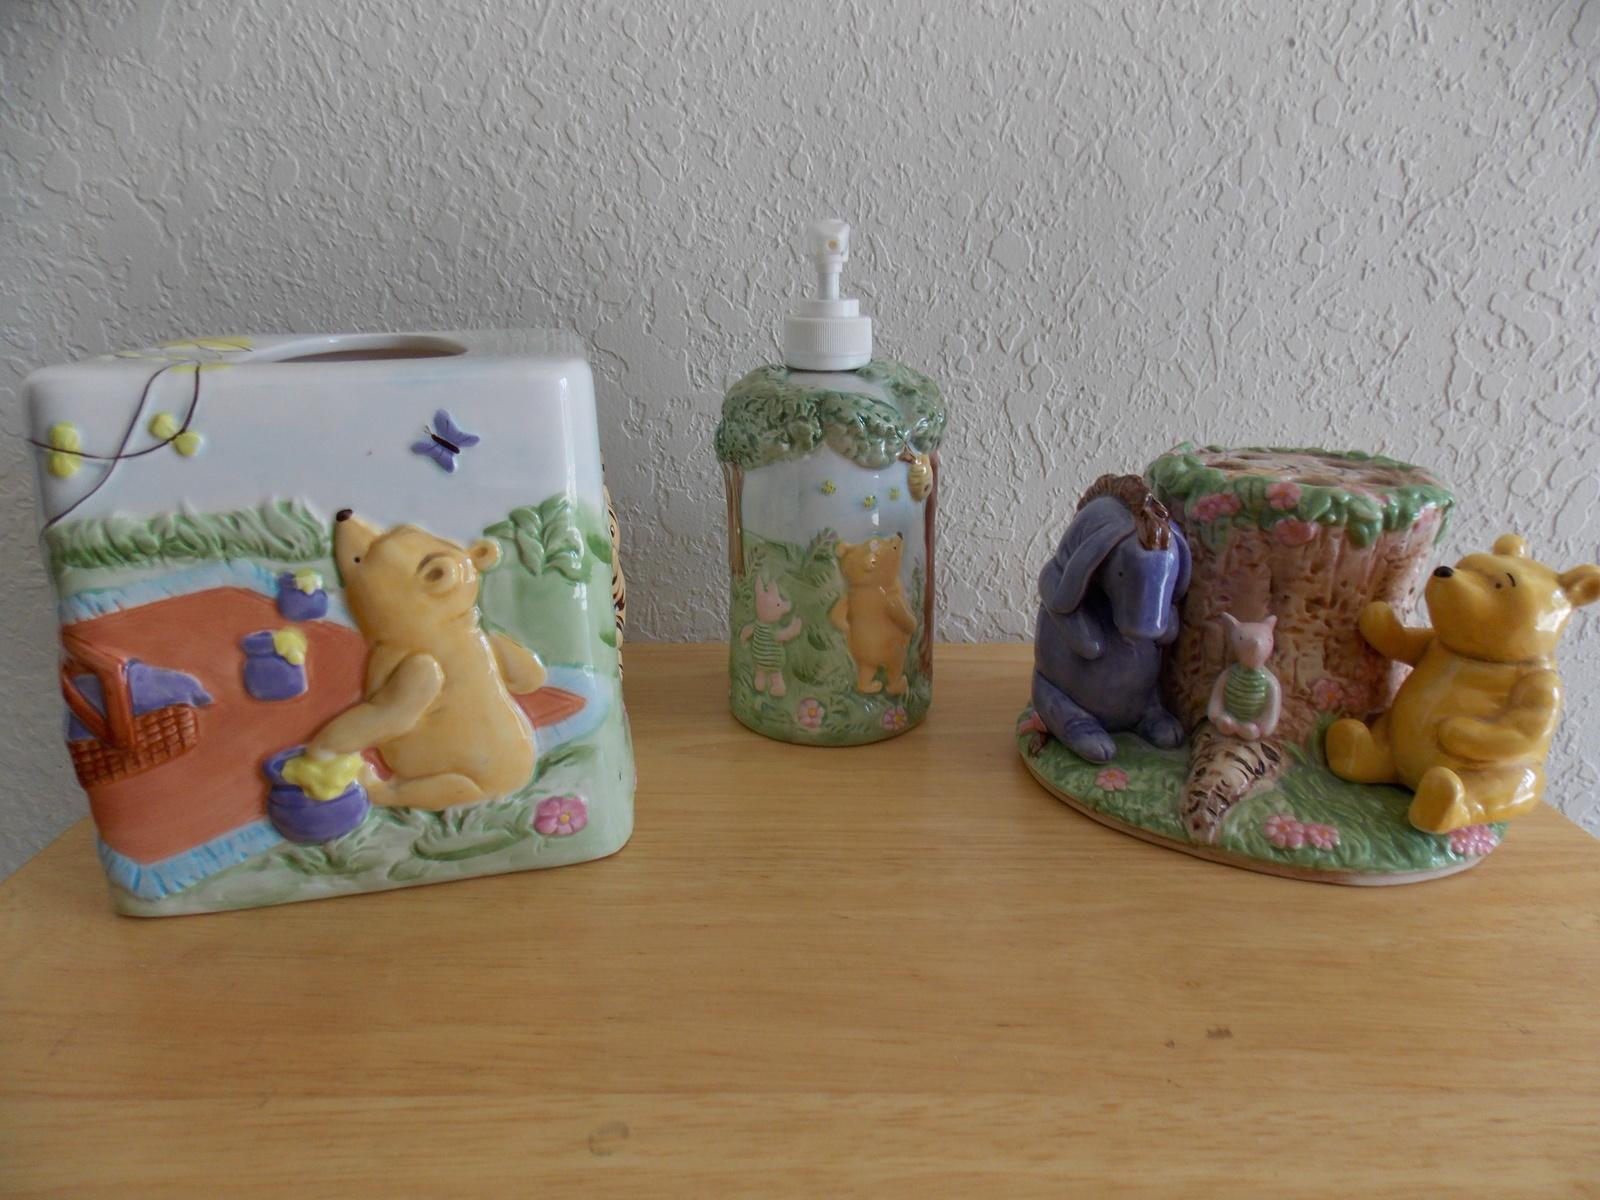 Disney Classic Winnie The Pooh 3pc Ceramic Bathroom Accs Set Other